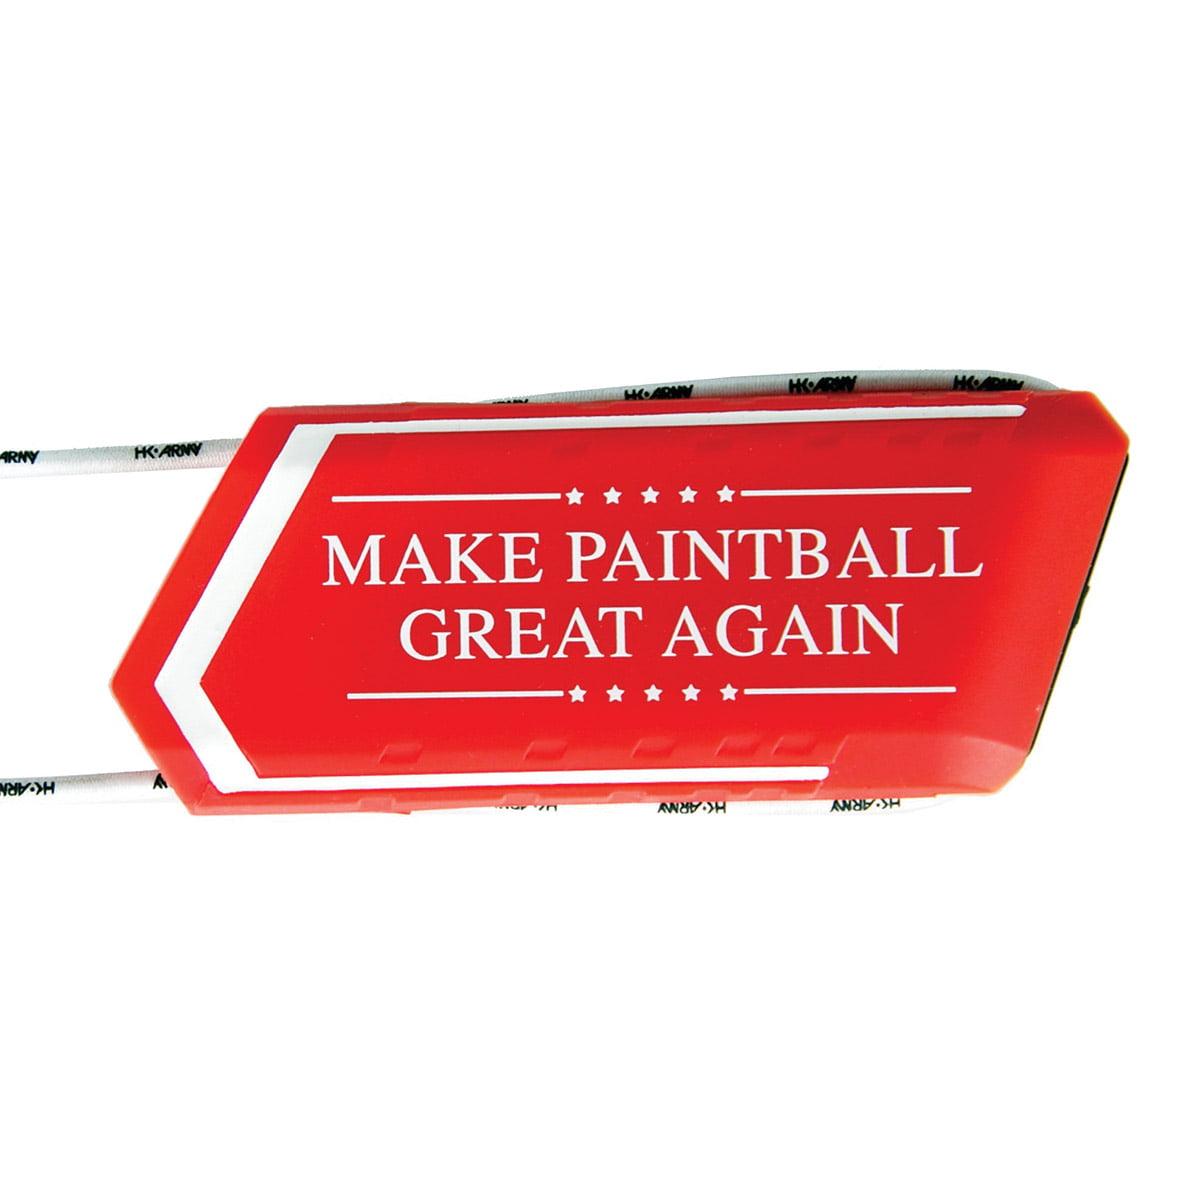 HK Army Barrel Condom / Cover - Ball Breaker 2.0 - Make Paintball Great Again